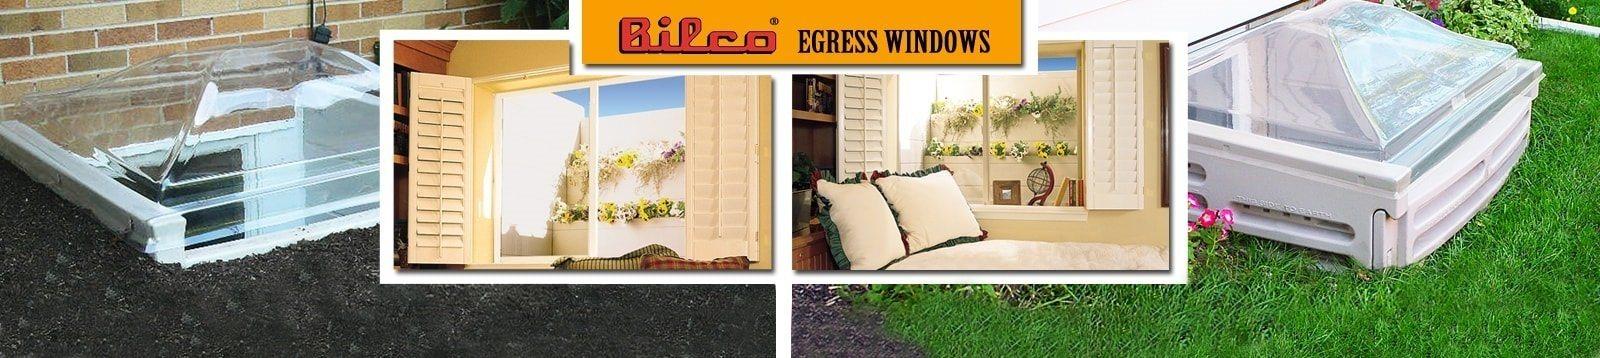 Bilco Egress Windows for Omaha, NE and Western Iowa